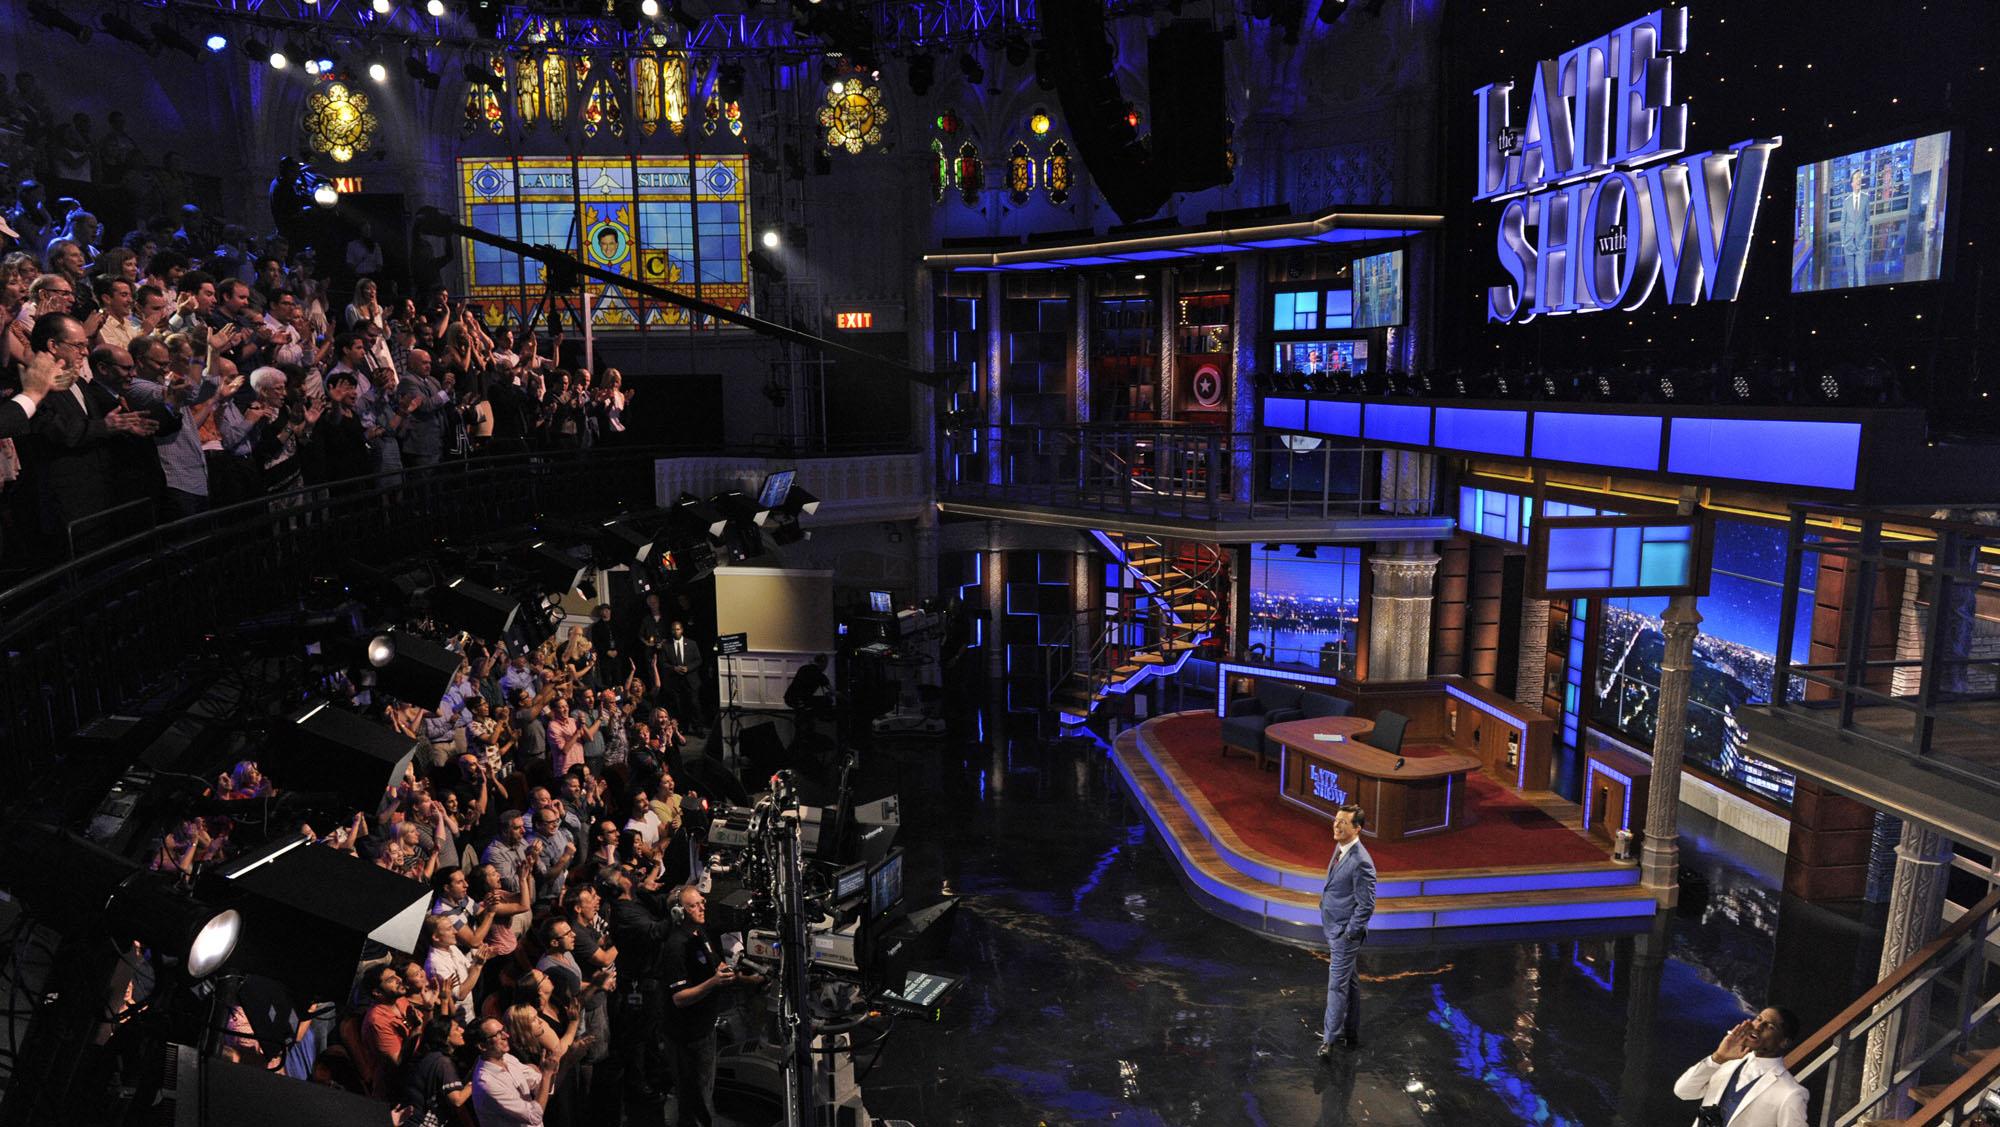 Stephen Colbert Late Show Premiere - H